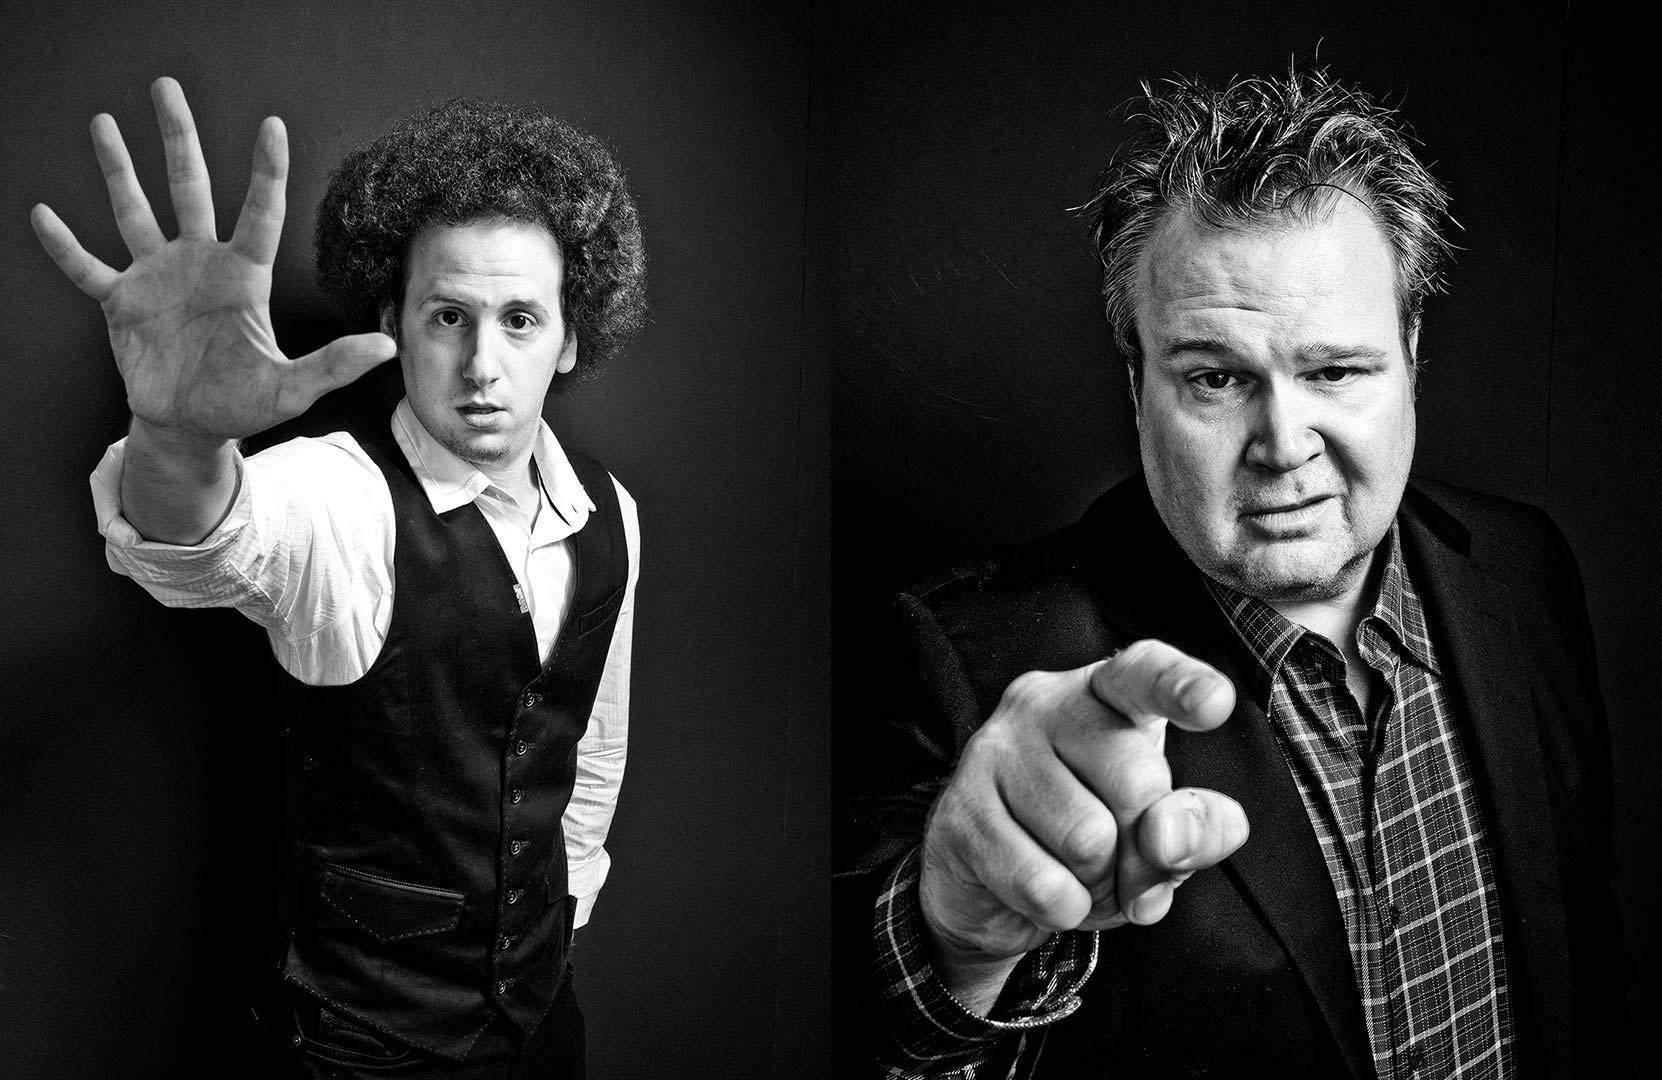 Black White Hollywood Celebrity Portrait Photography